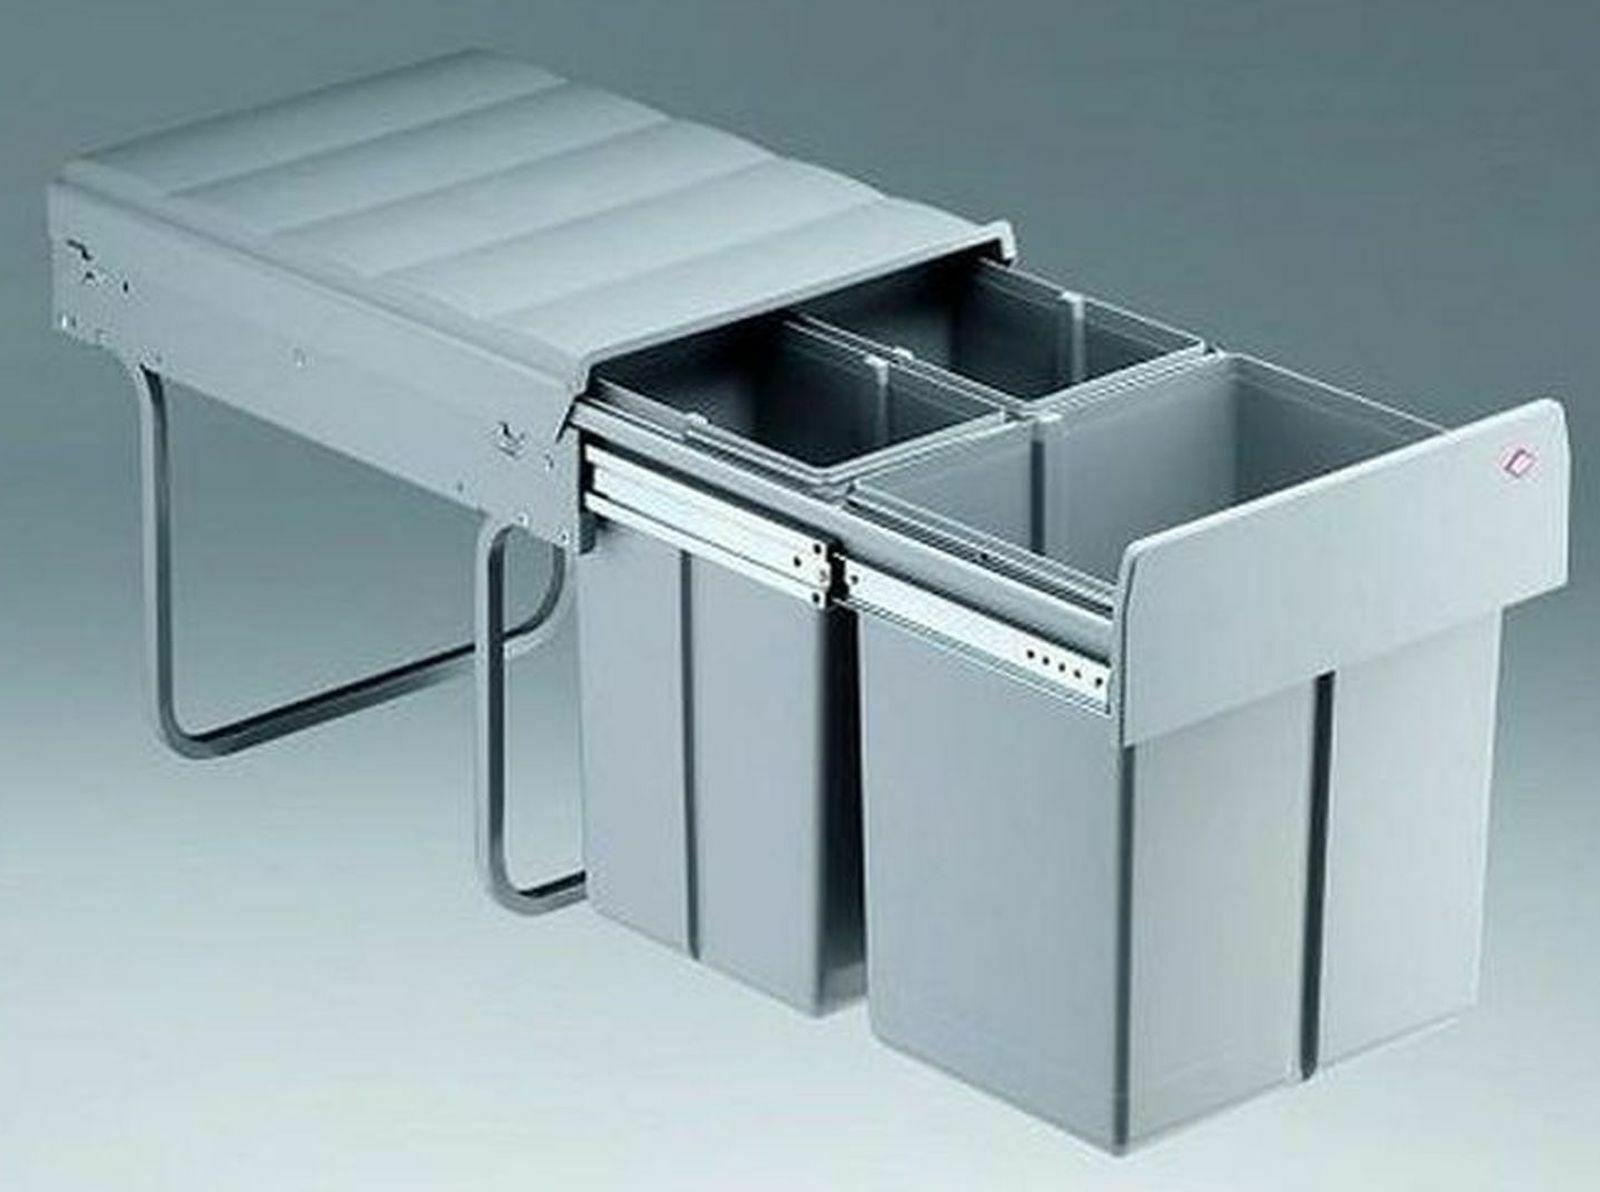 Full Size of Müllsystem 5e2706dac85ea Küche Wohnzimmer Müllsystem